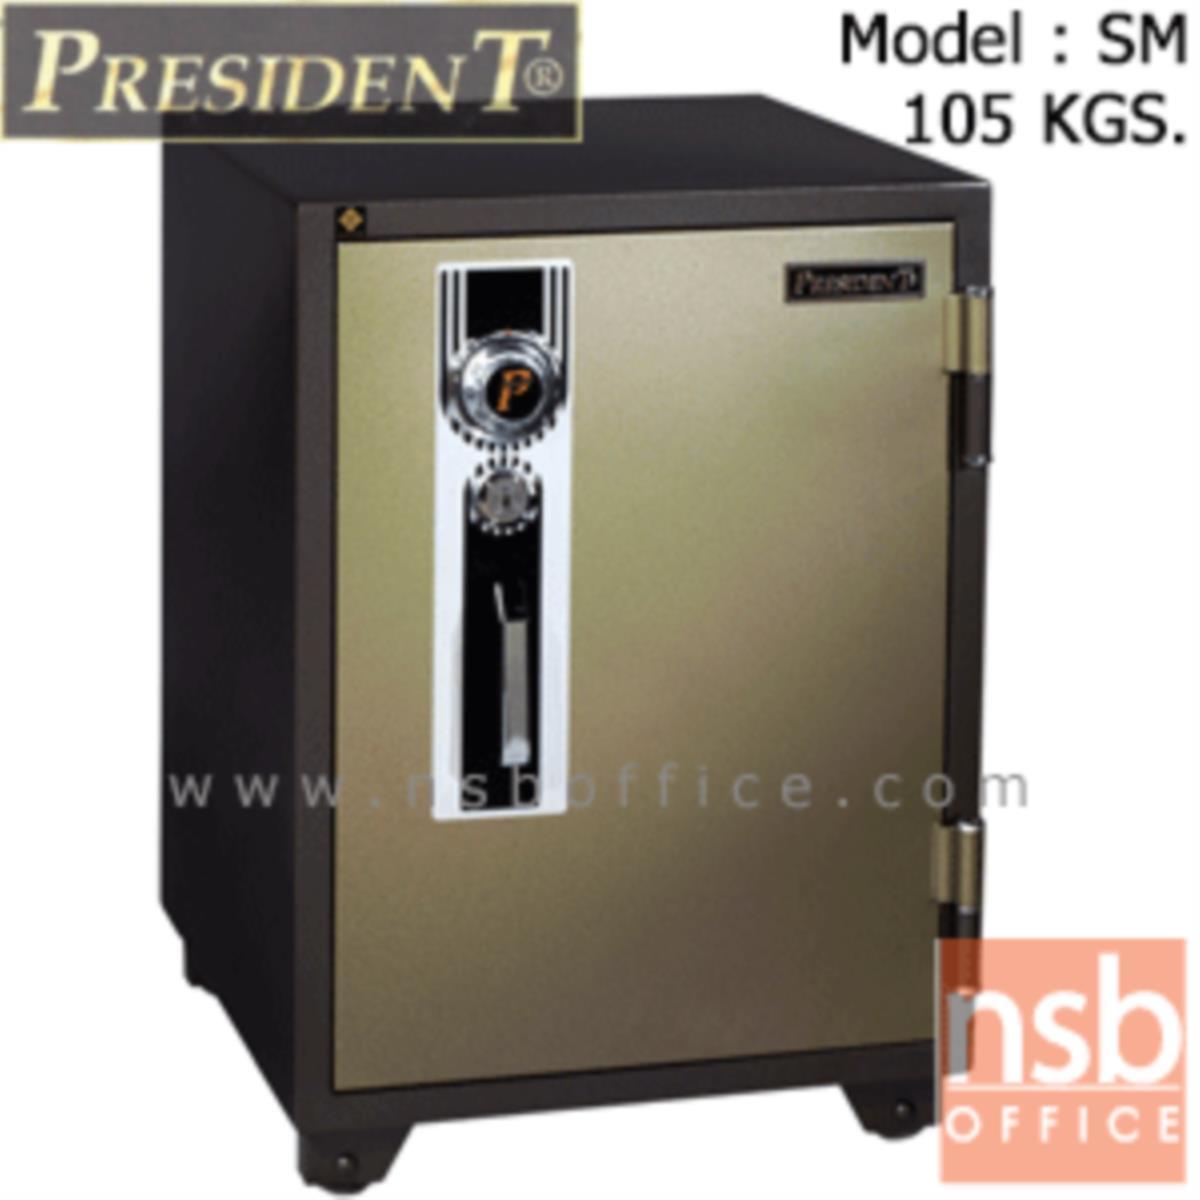 F05A011:ตู้เซฟนิรภัยชนิดหมุน 105 กก. รุ่น PRESIDENT-SM มี 1 กุญแจ 1 รหัส (รหัสใช้หมุนหน้าตู้)